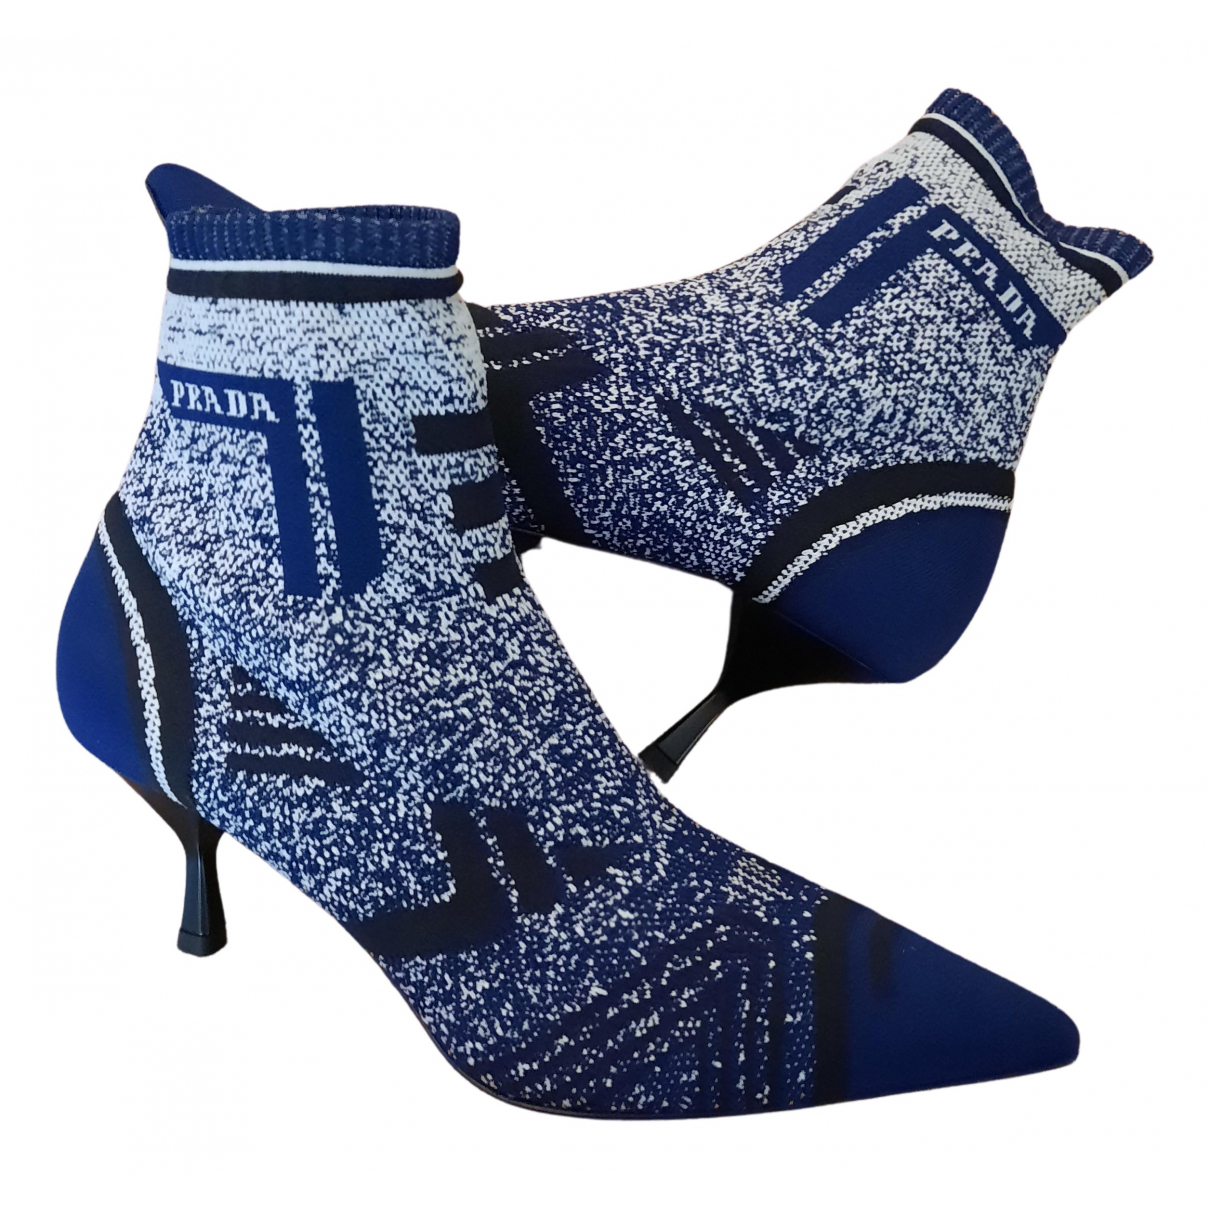 Prada \N Stiefeletten in  Blau Polyester